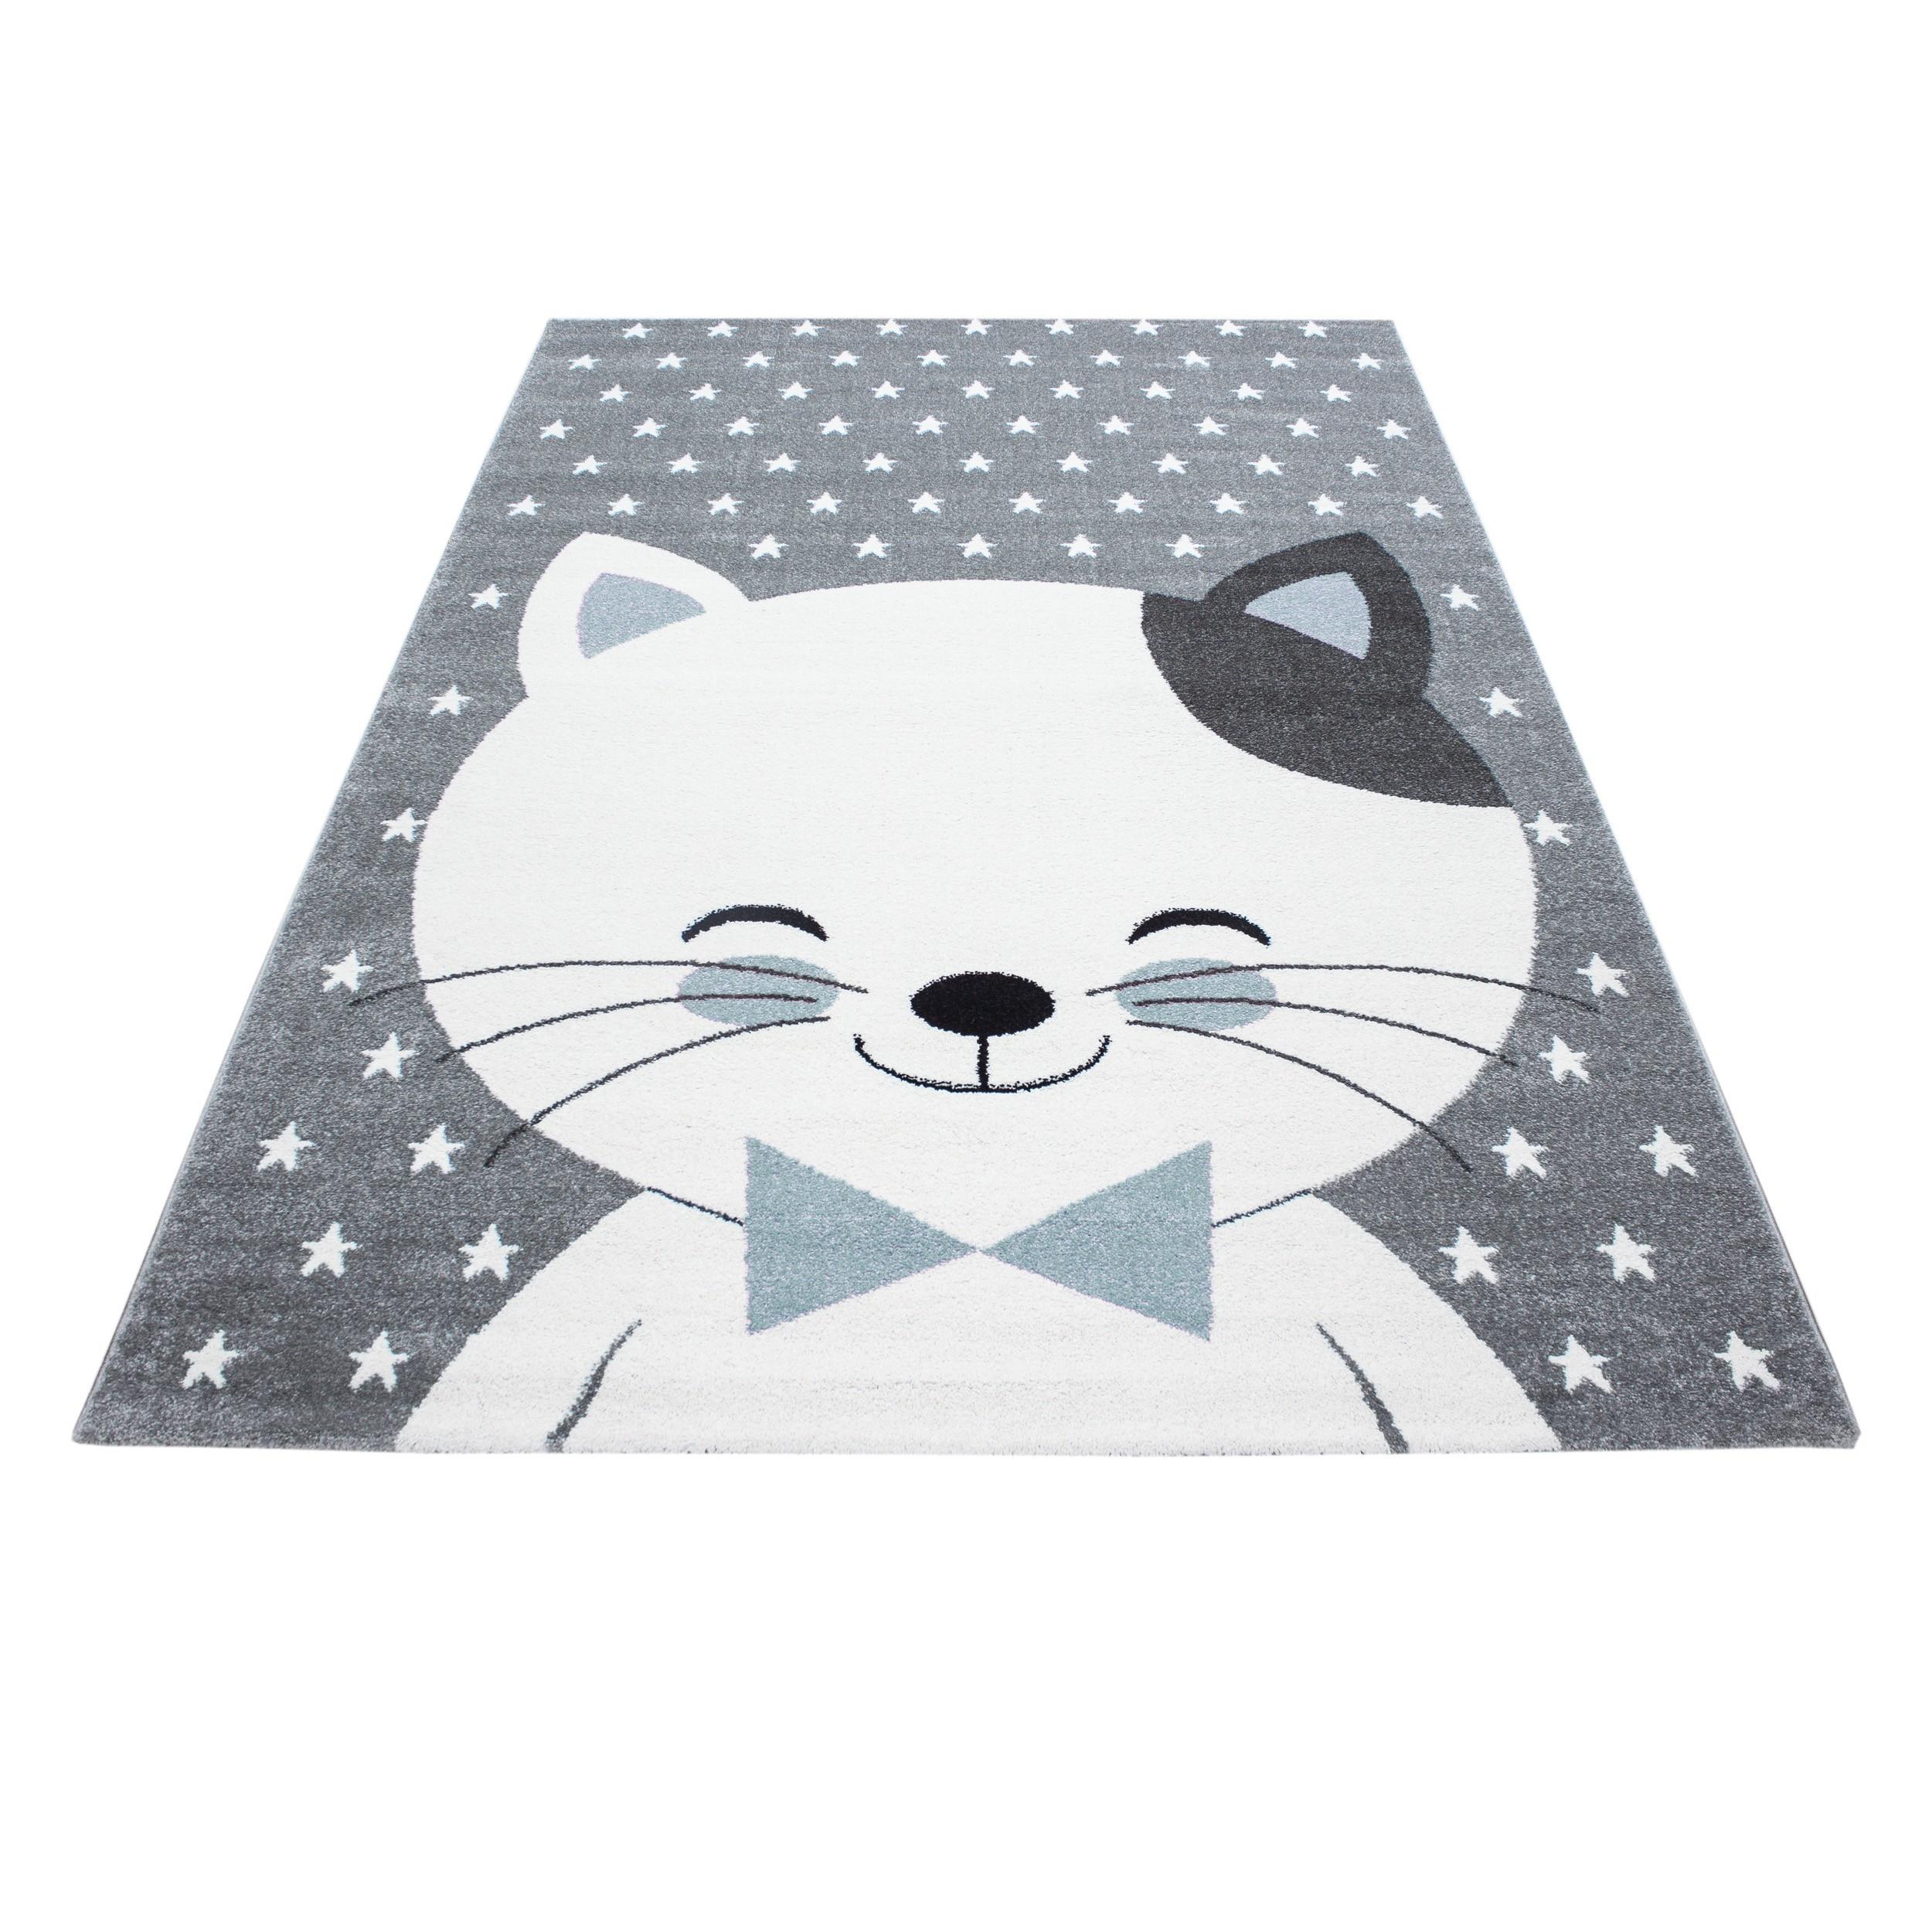 Zimmer Grau Blau: Kinderteppich Kinderzimmer Teppich Katze Sternmotiv Grau